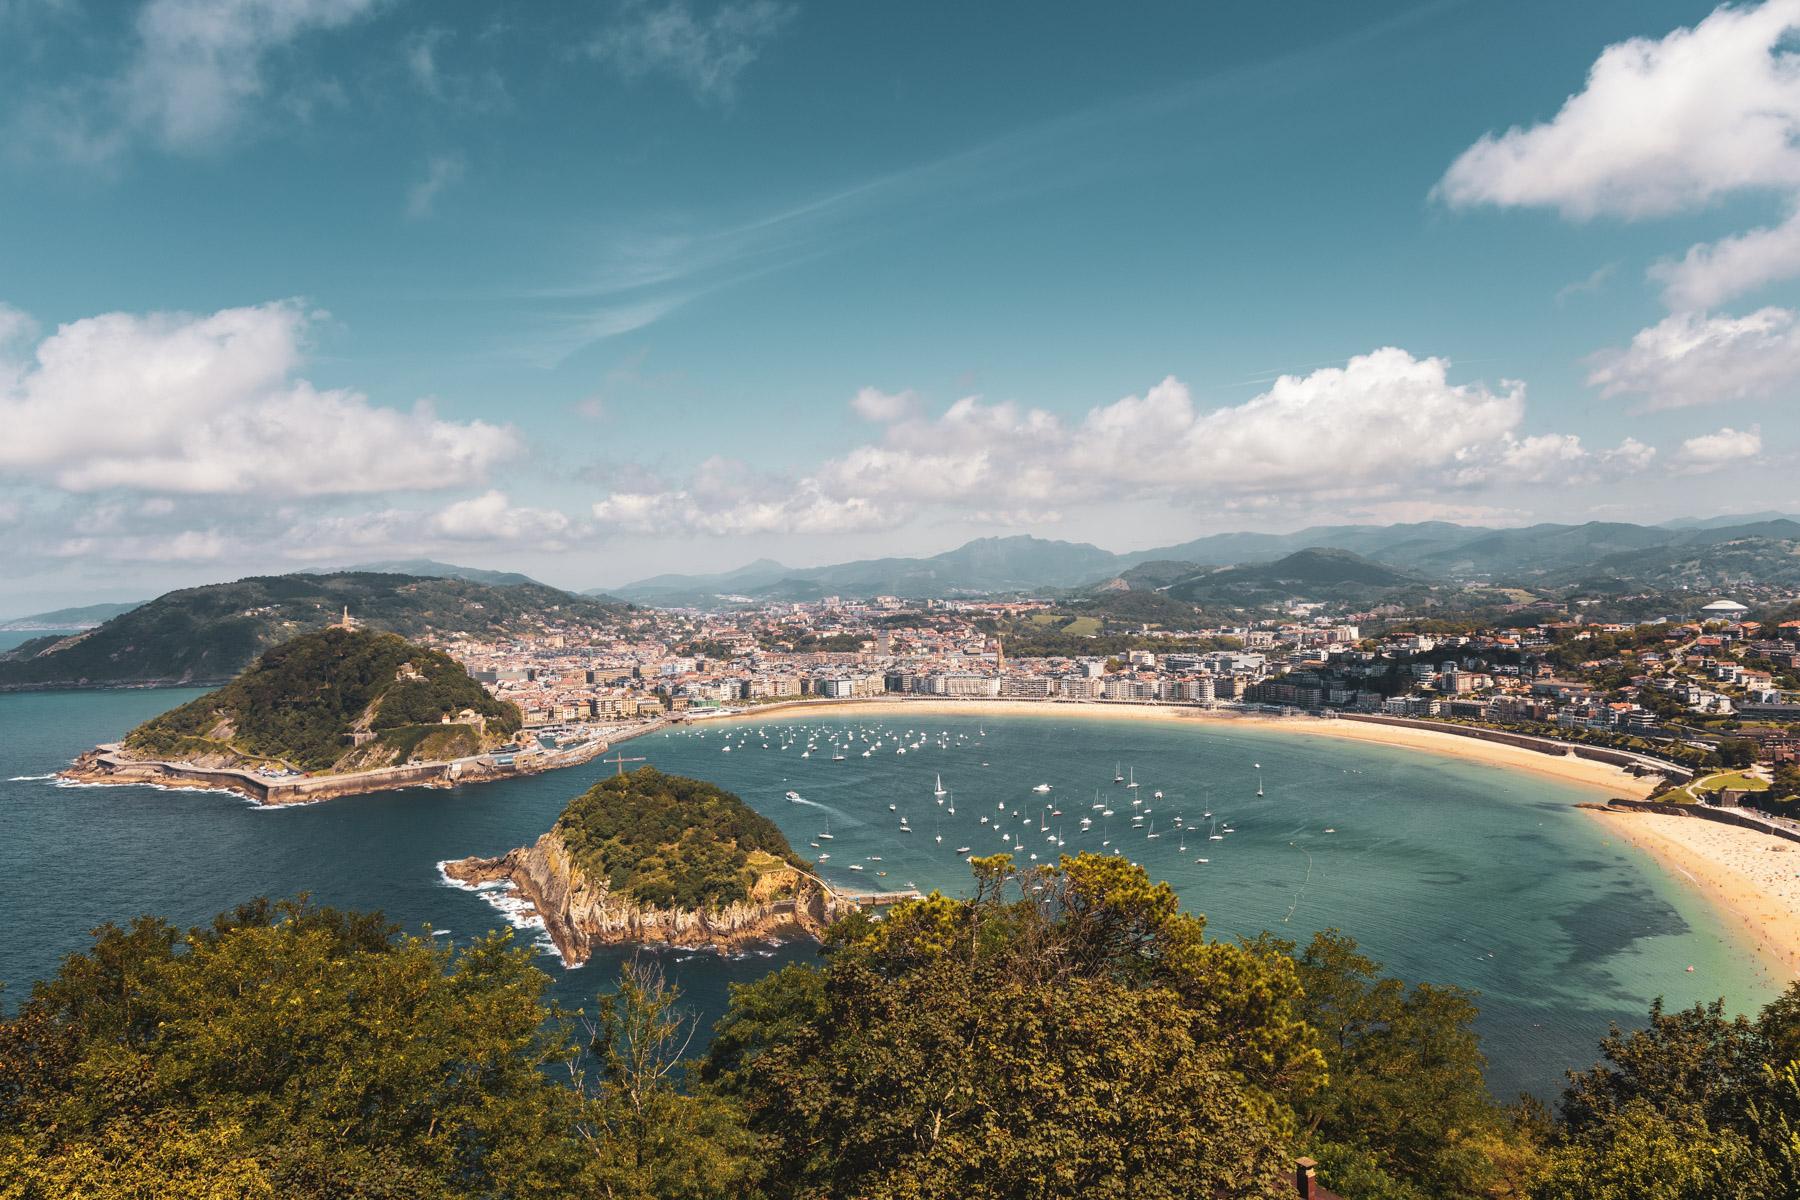 Städtetrip San Sebastian - Reisebericht und Reisetipps